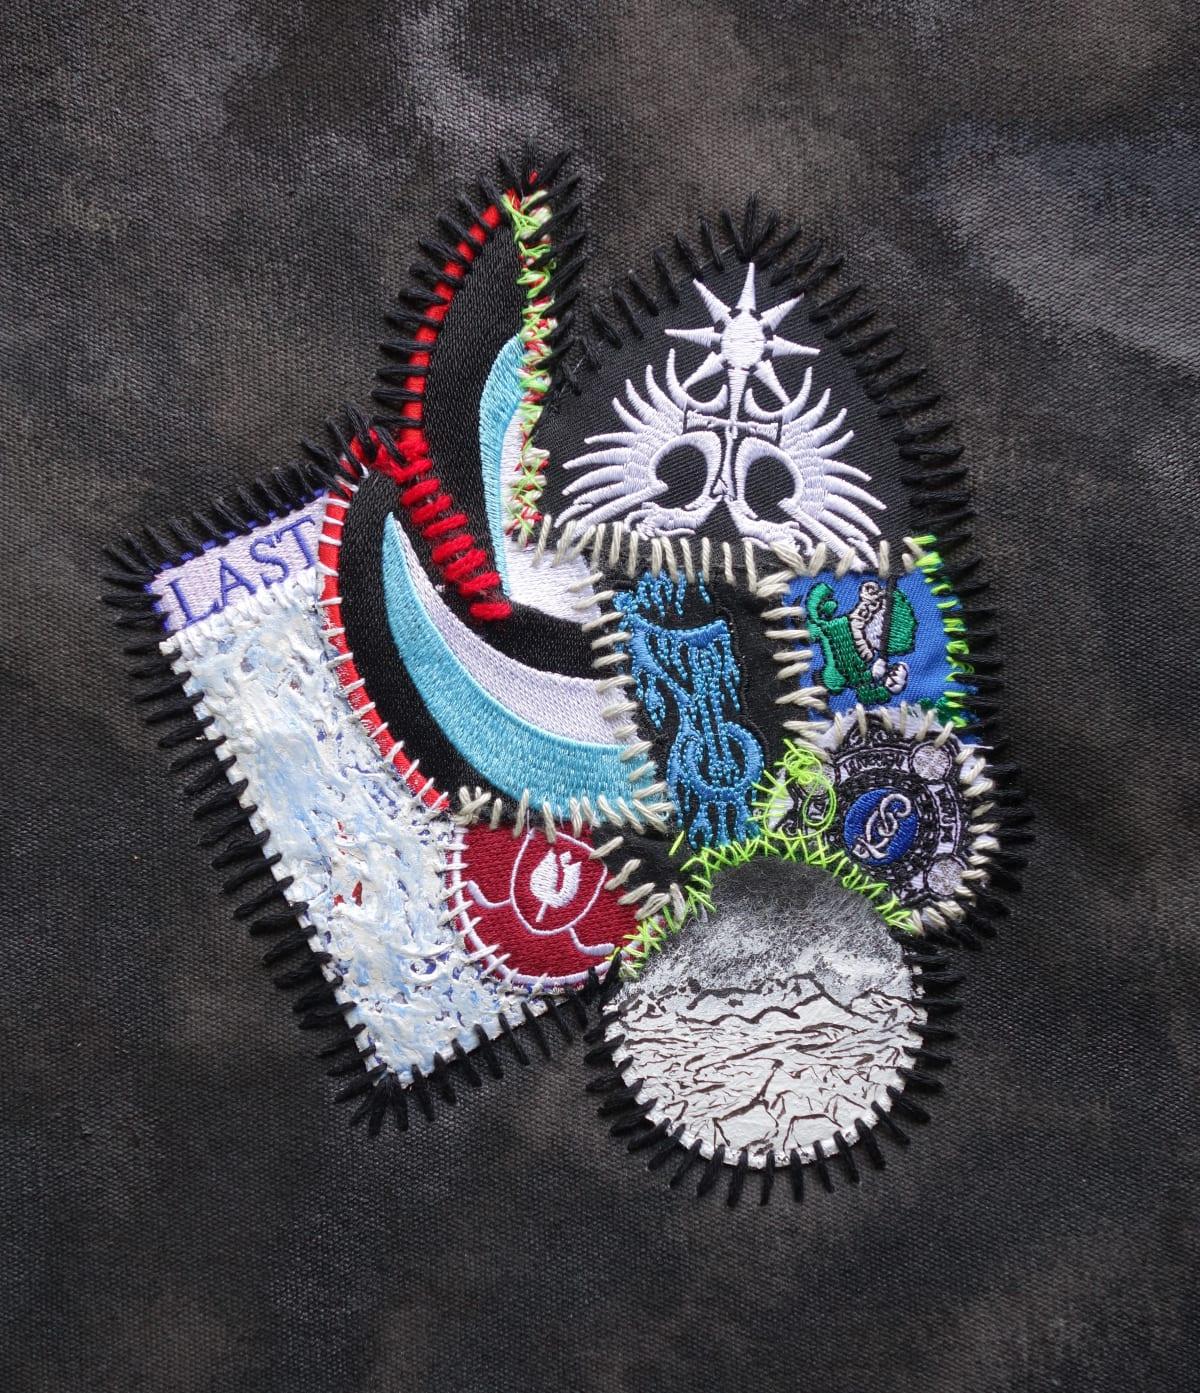 Stephen Eastaugh LAST ISLAND, 2015 Acrylic, wool, cotton badges, canvas wooden frame 410 x 330 mm